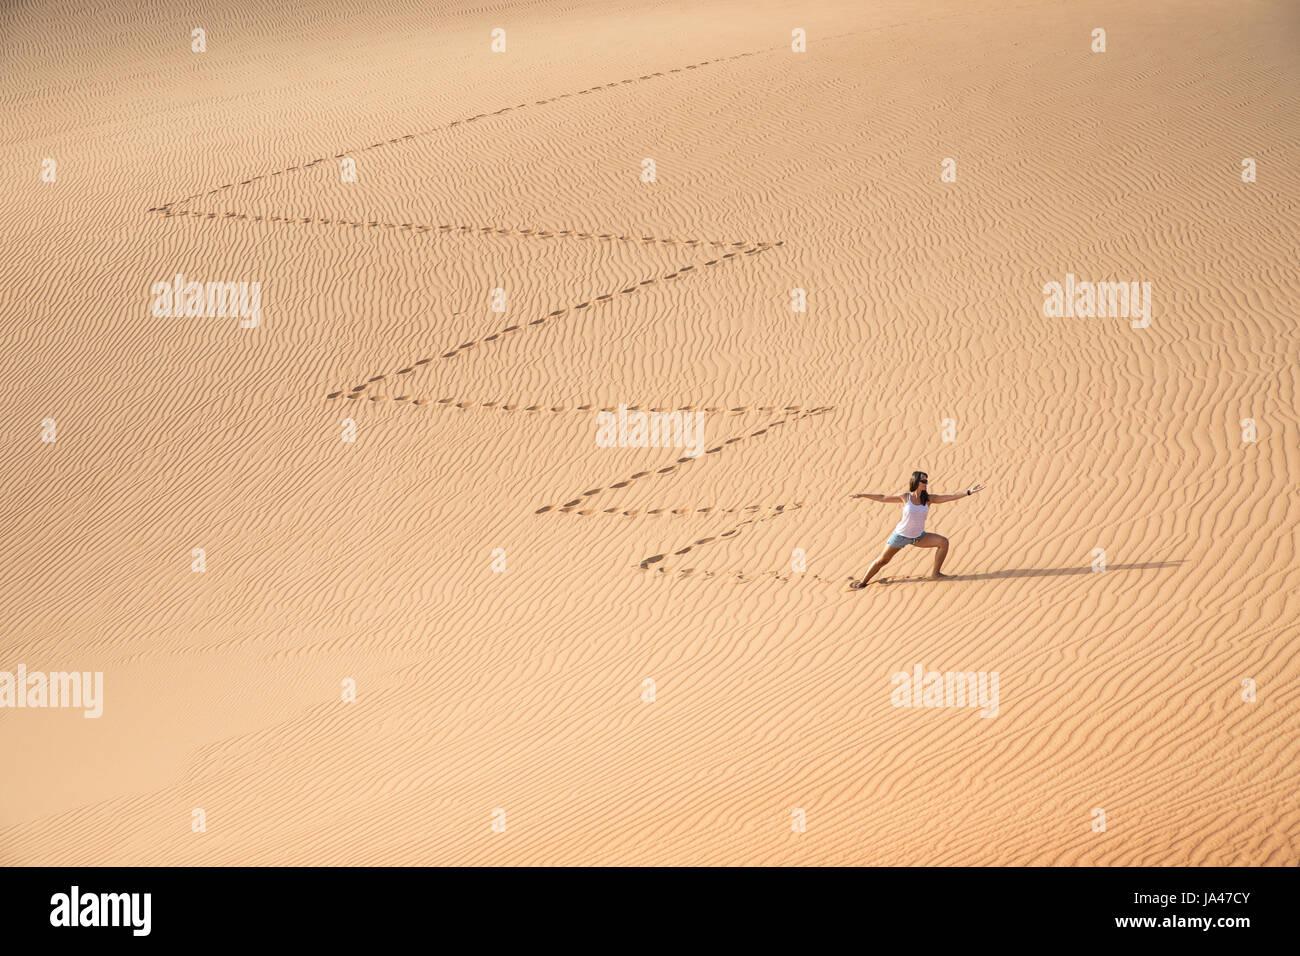 Beautiful woman hiking on giant sand dunes while making a zig zag pattern. Liwa desert, UAE. - Stock Image